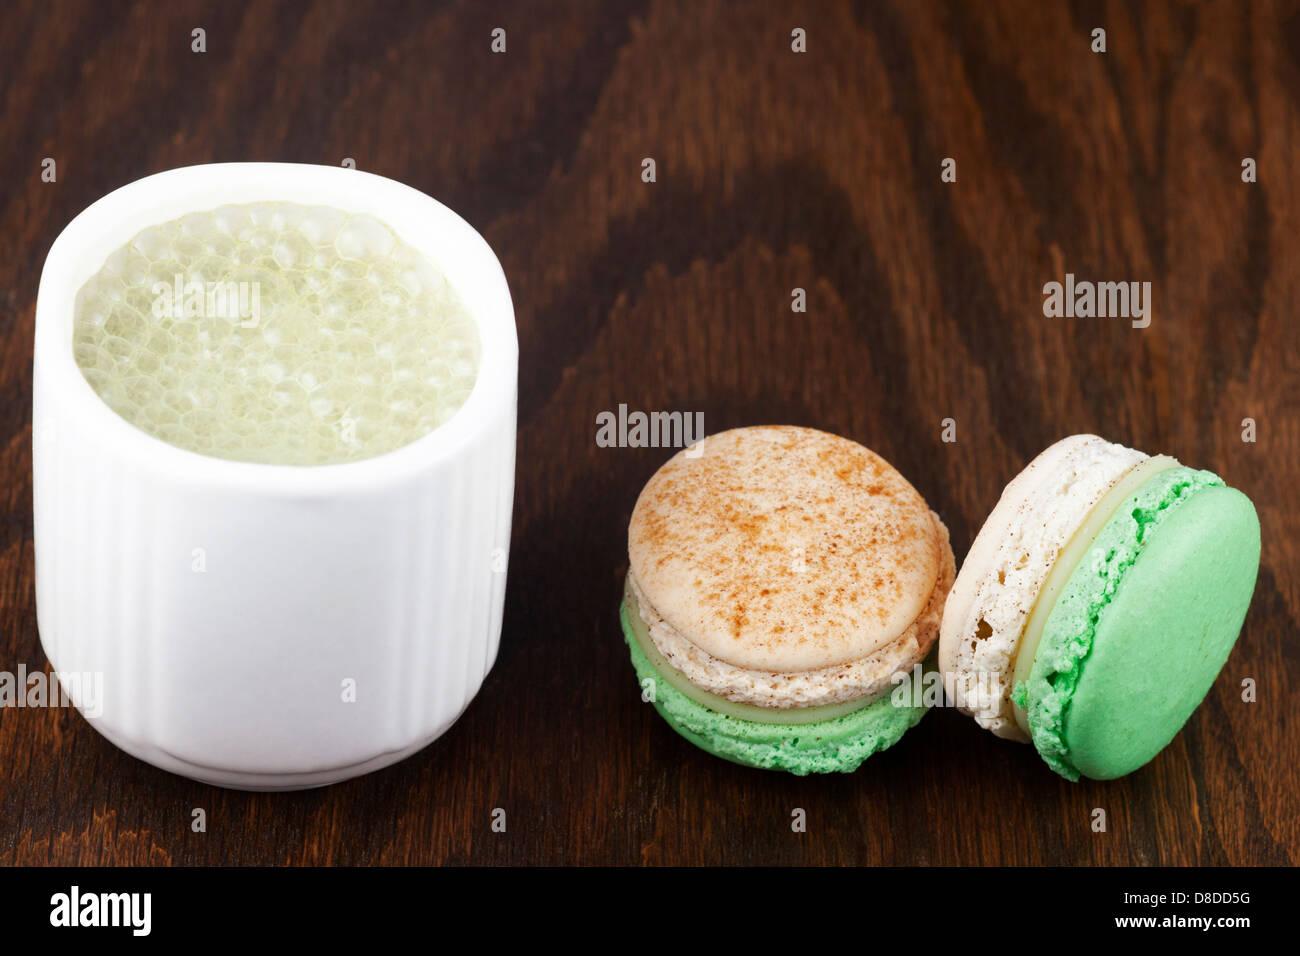 Matcha latte made with almond milk and apple cinnamon macarons - Stock Image